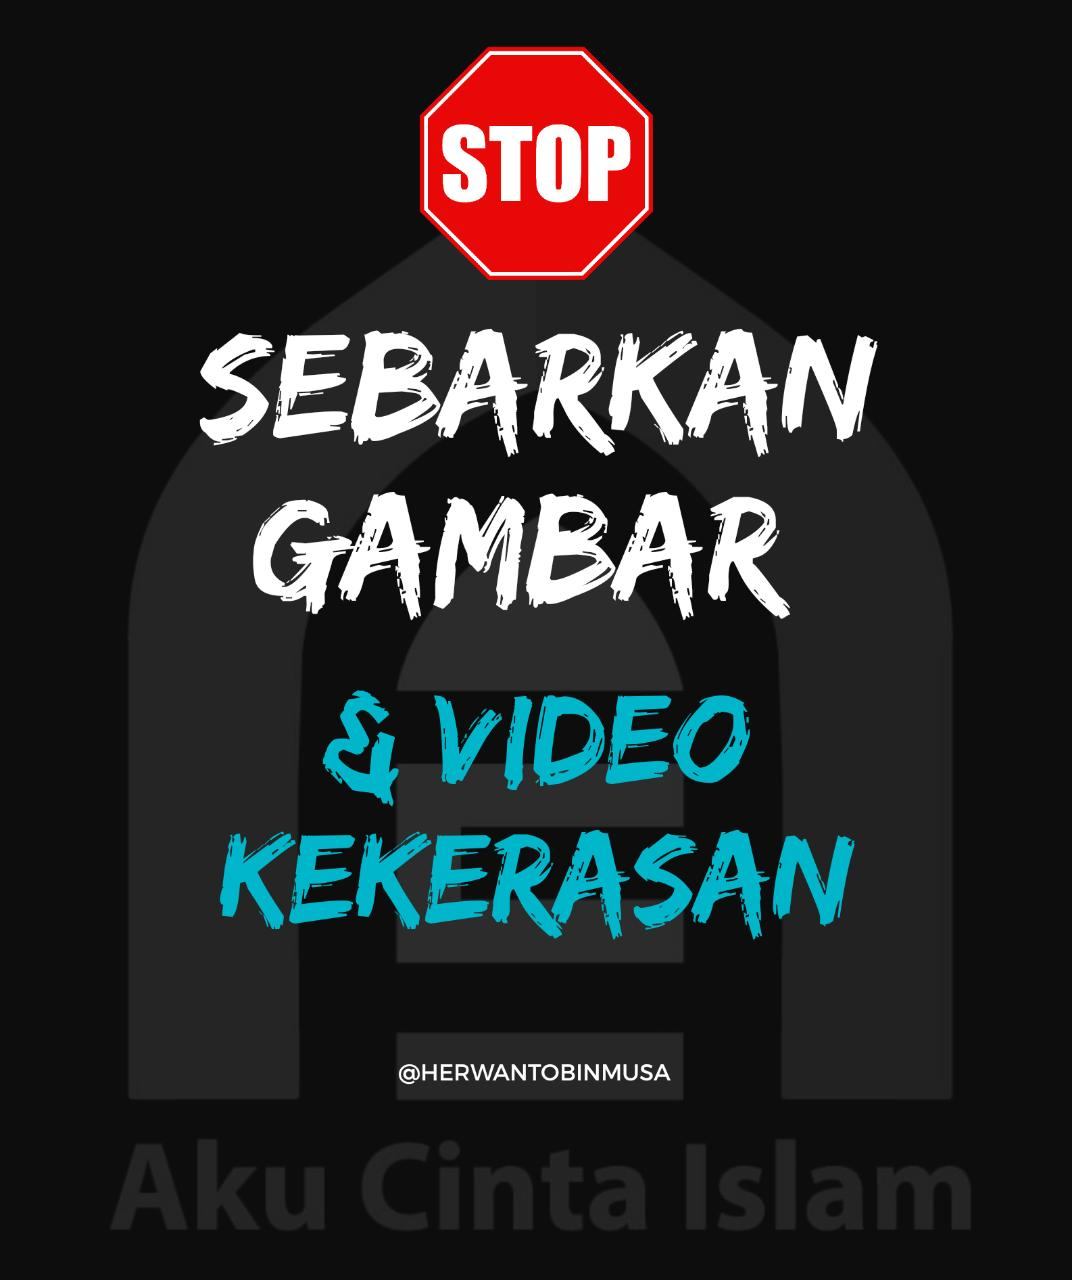 Jangan Share Video Penembakan, Ini Alasannya